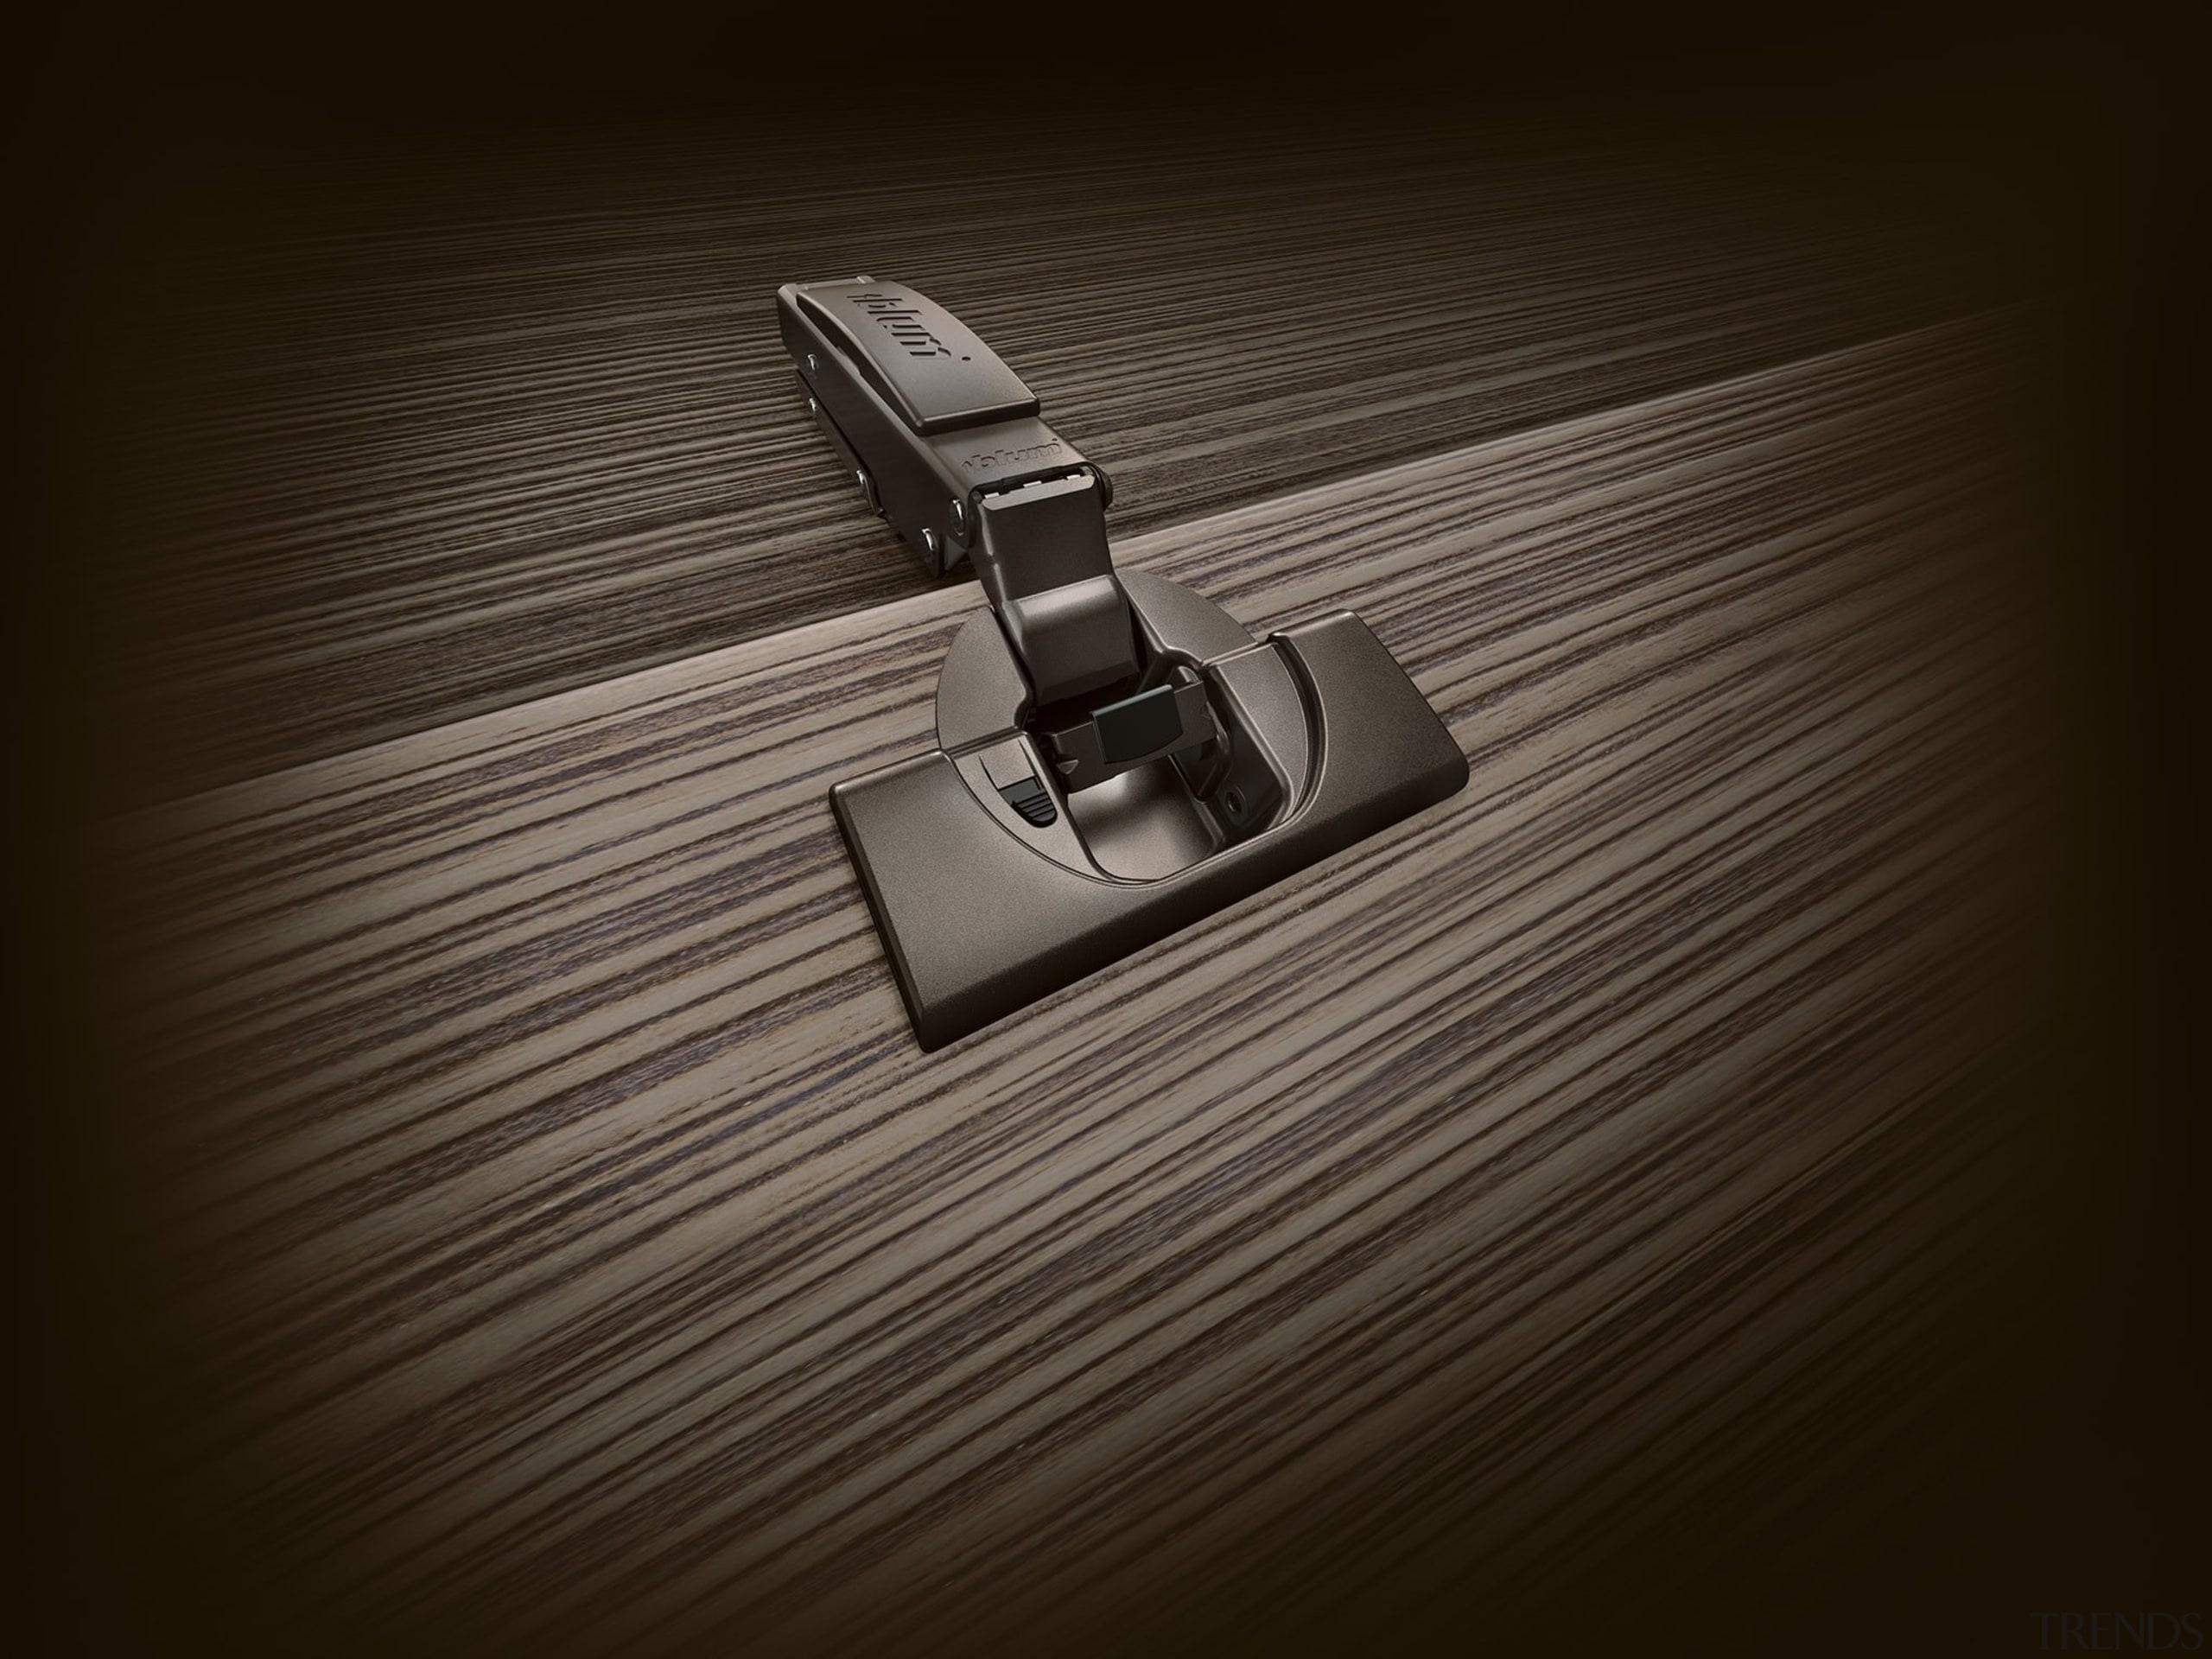 Innovative technology and award-winning design - Innovative technology light, line, product design, black